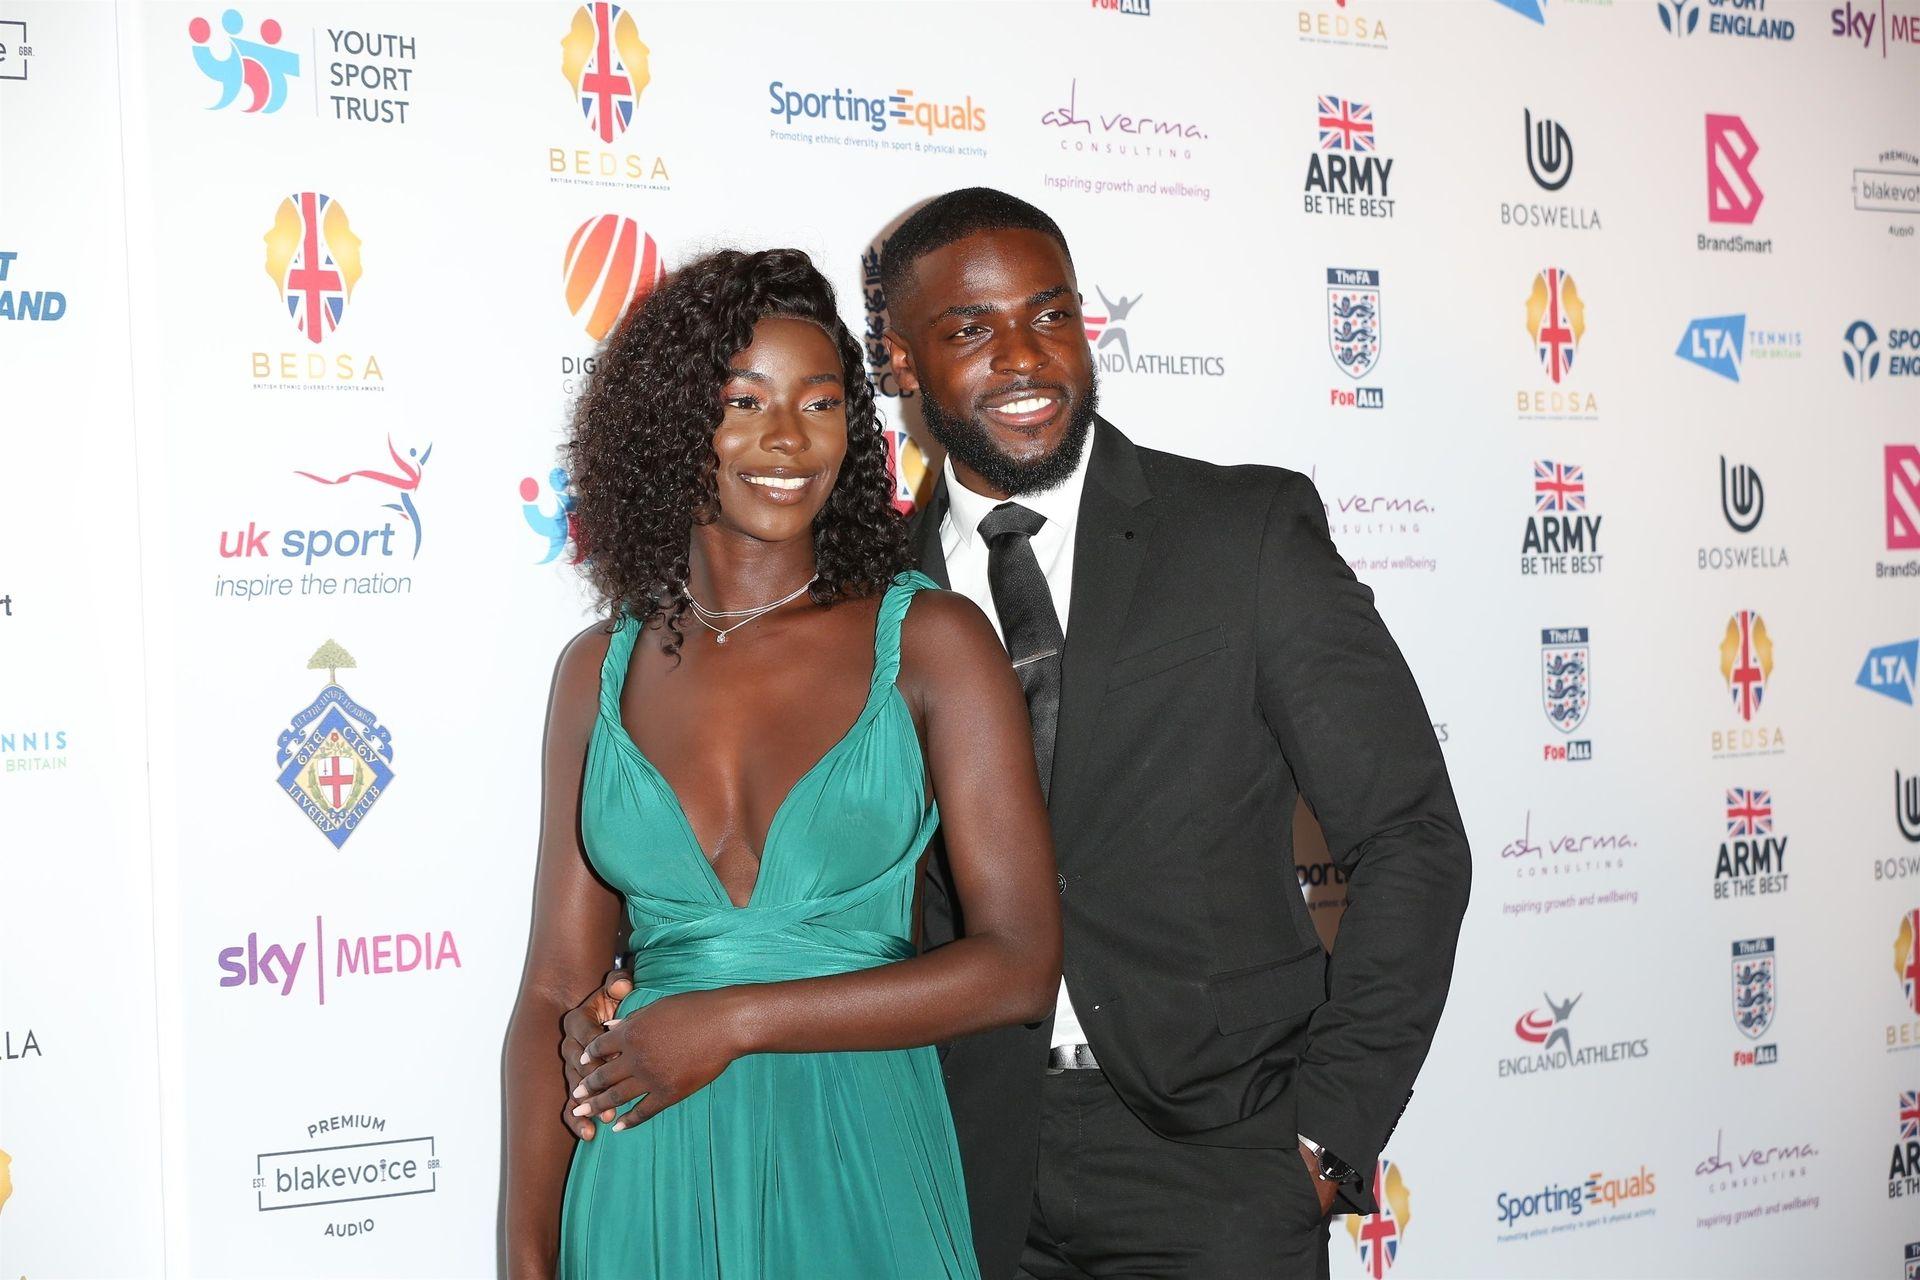 Mike Boateng & Priscilla Anyabu Are Seen At British Ethnic Diversity Sports Awards 0054